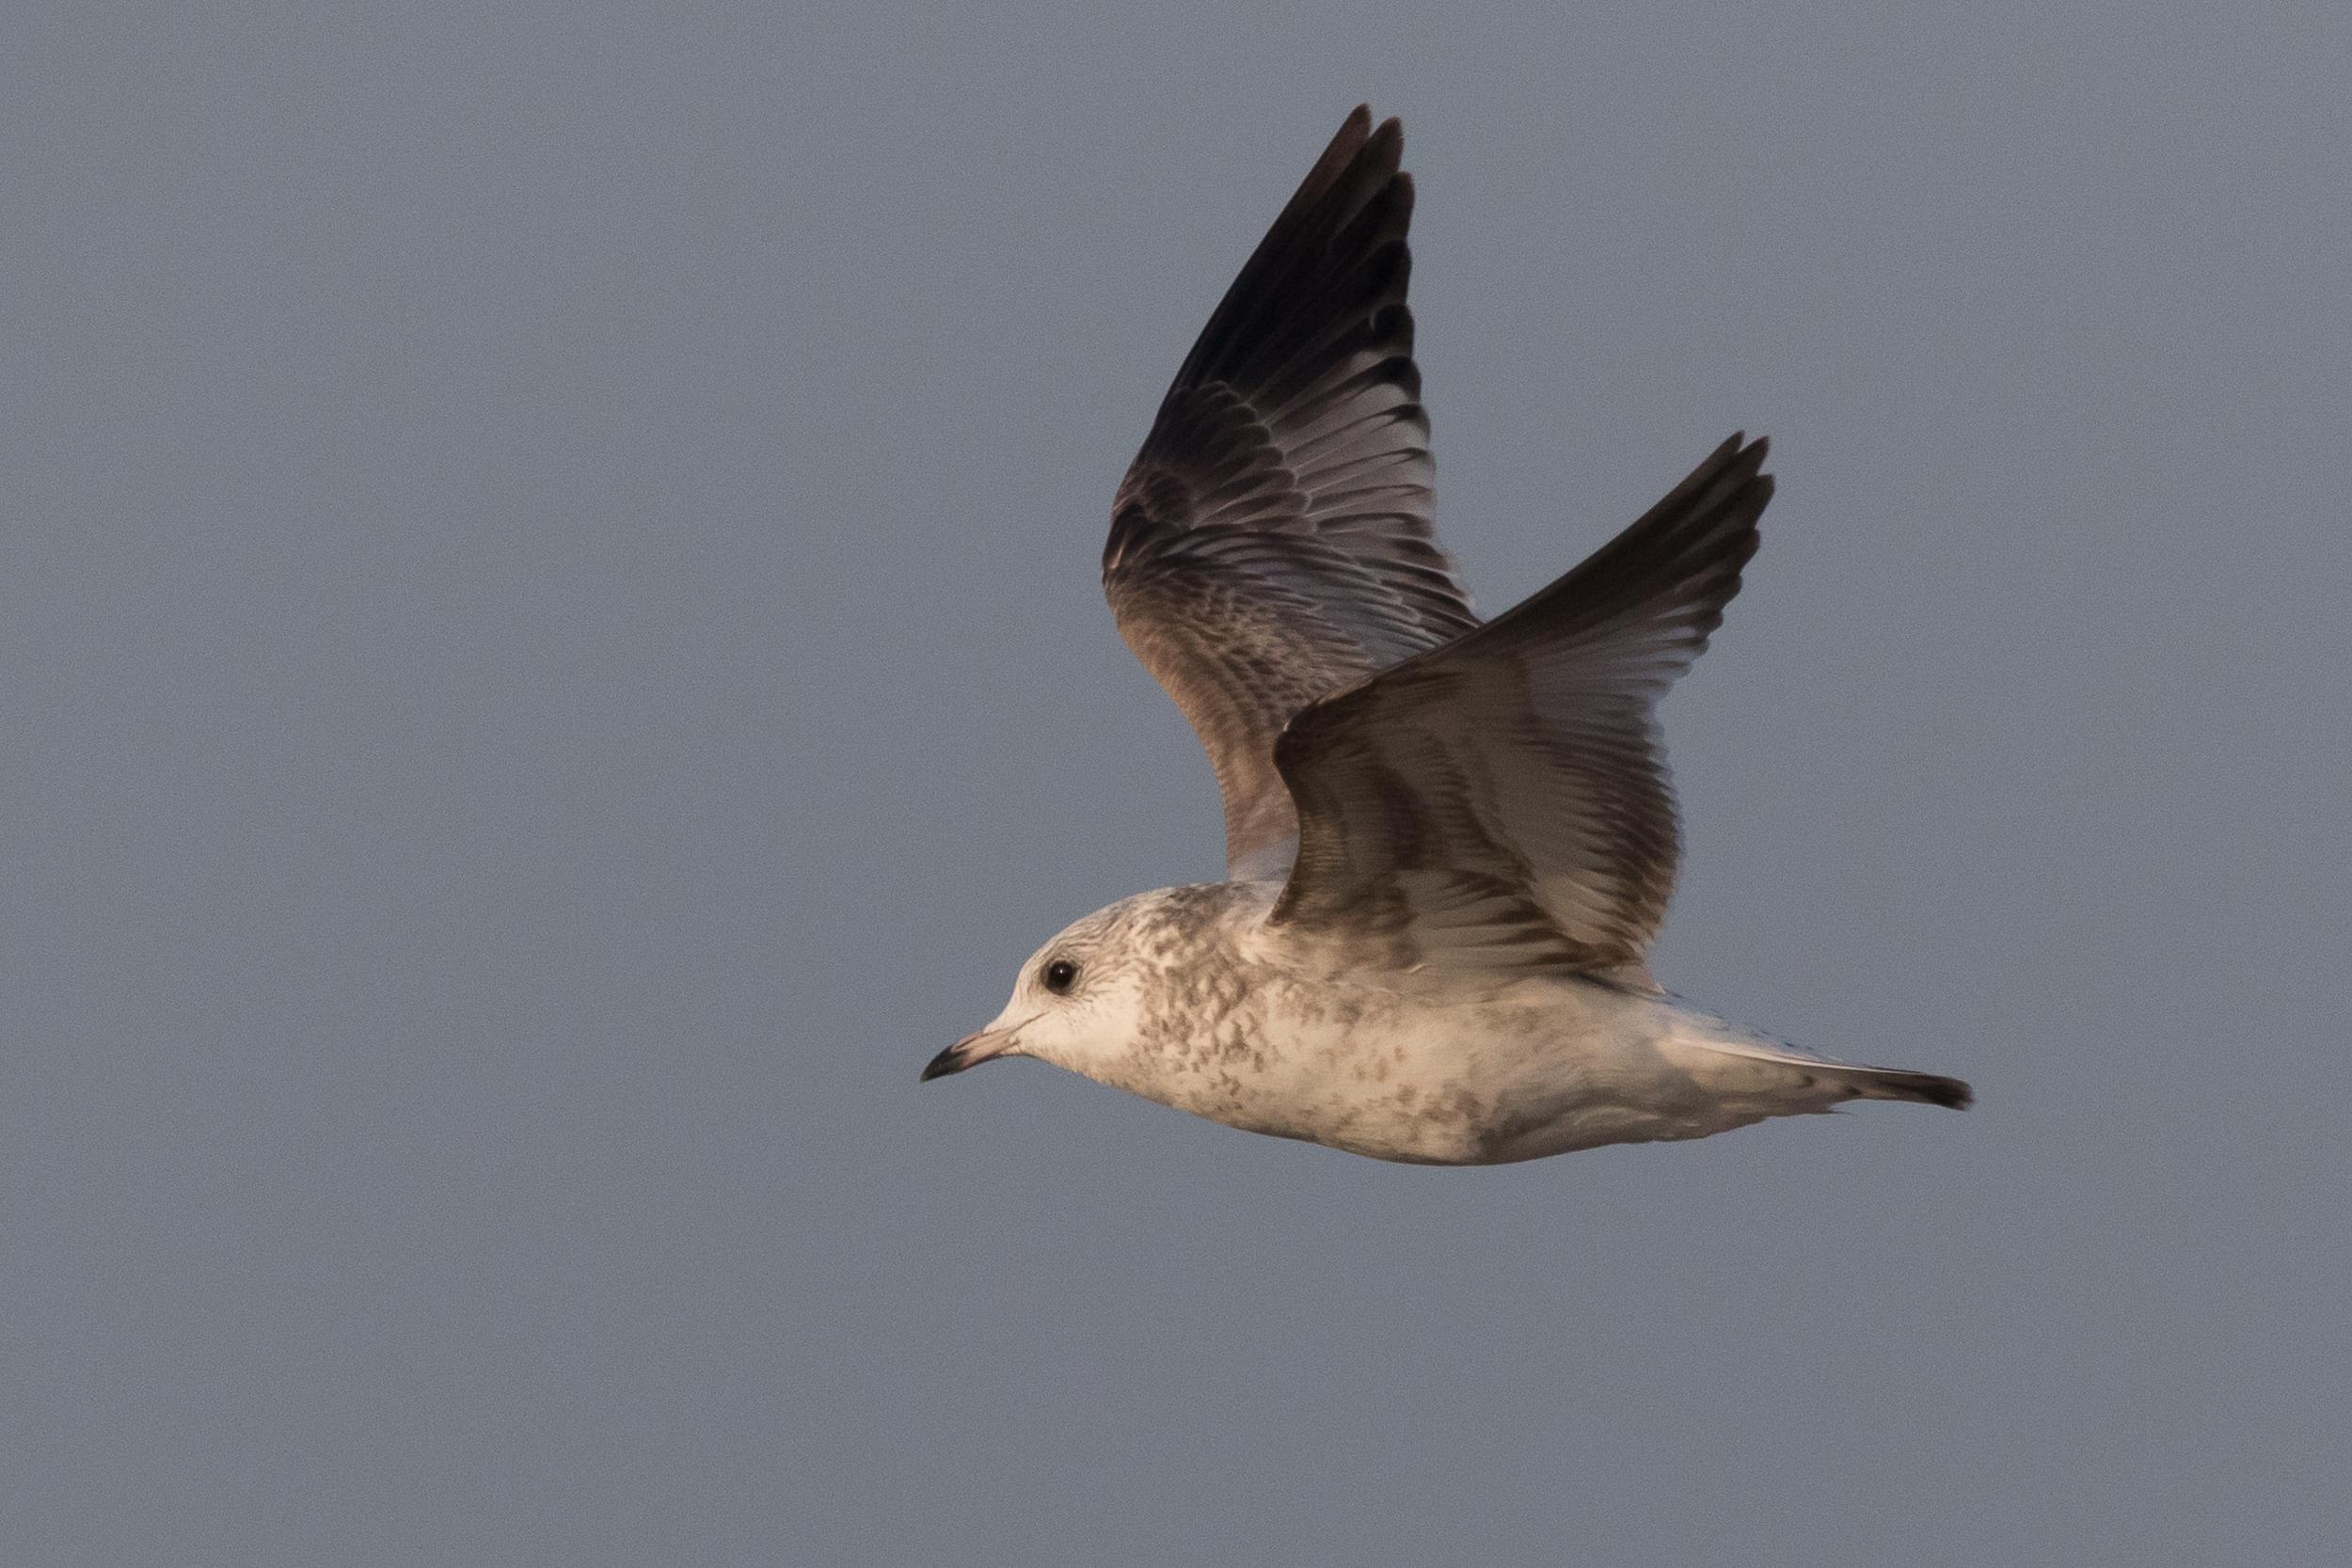 20170126-Common Gull 2CY-41.jpg